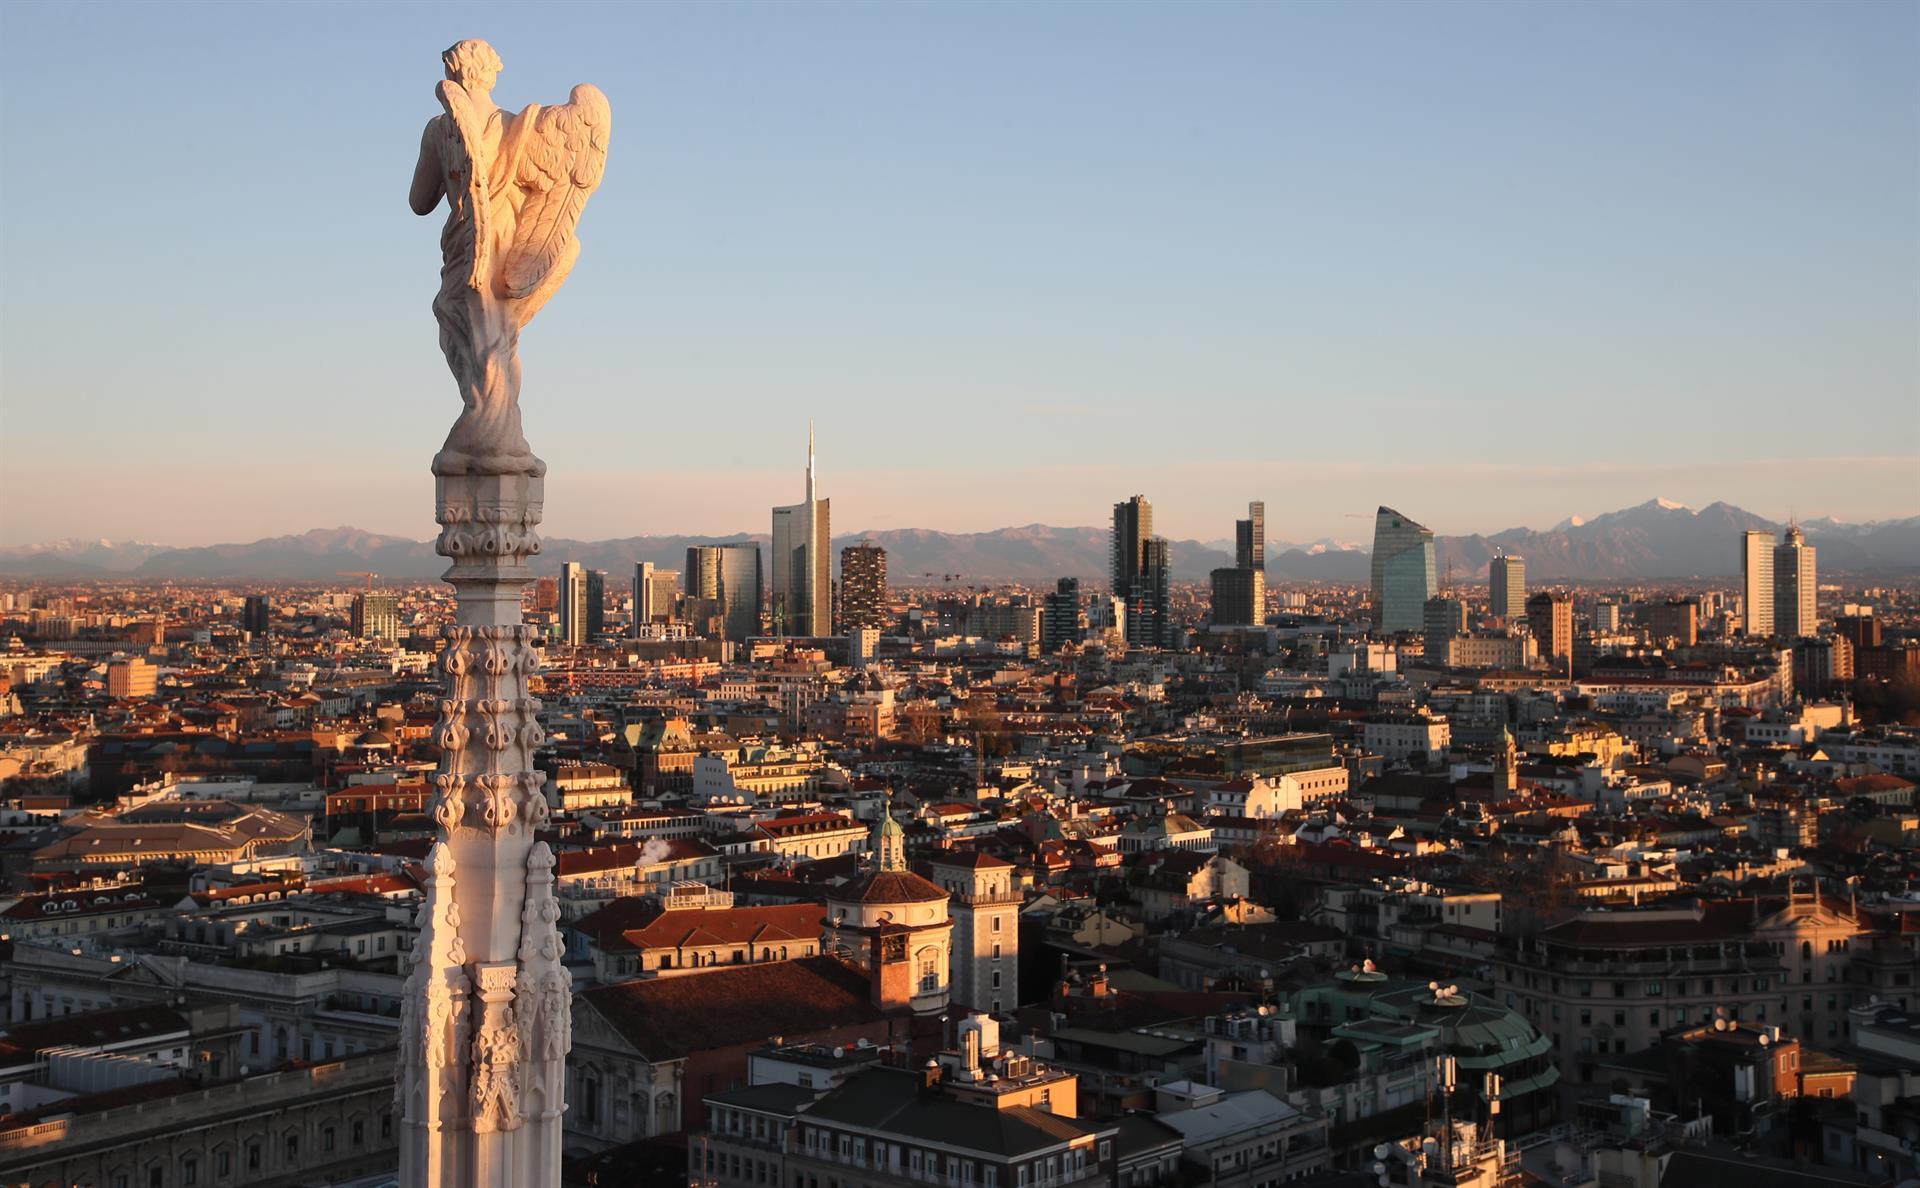 Duomo Cherchi8